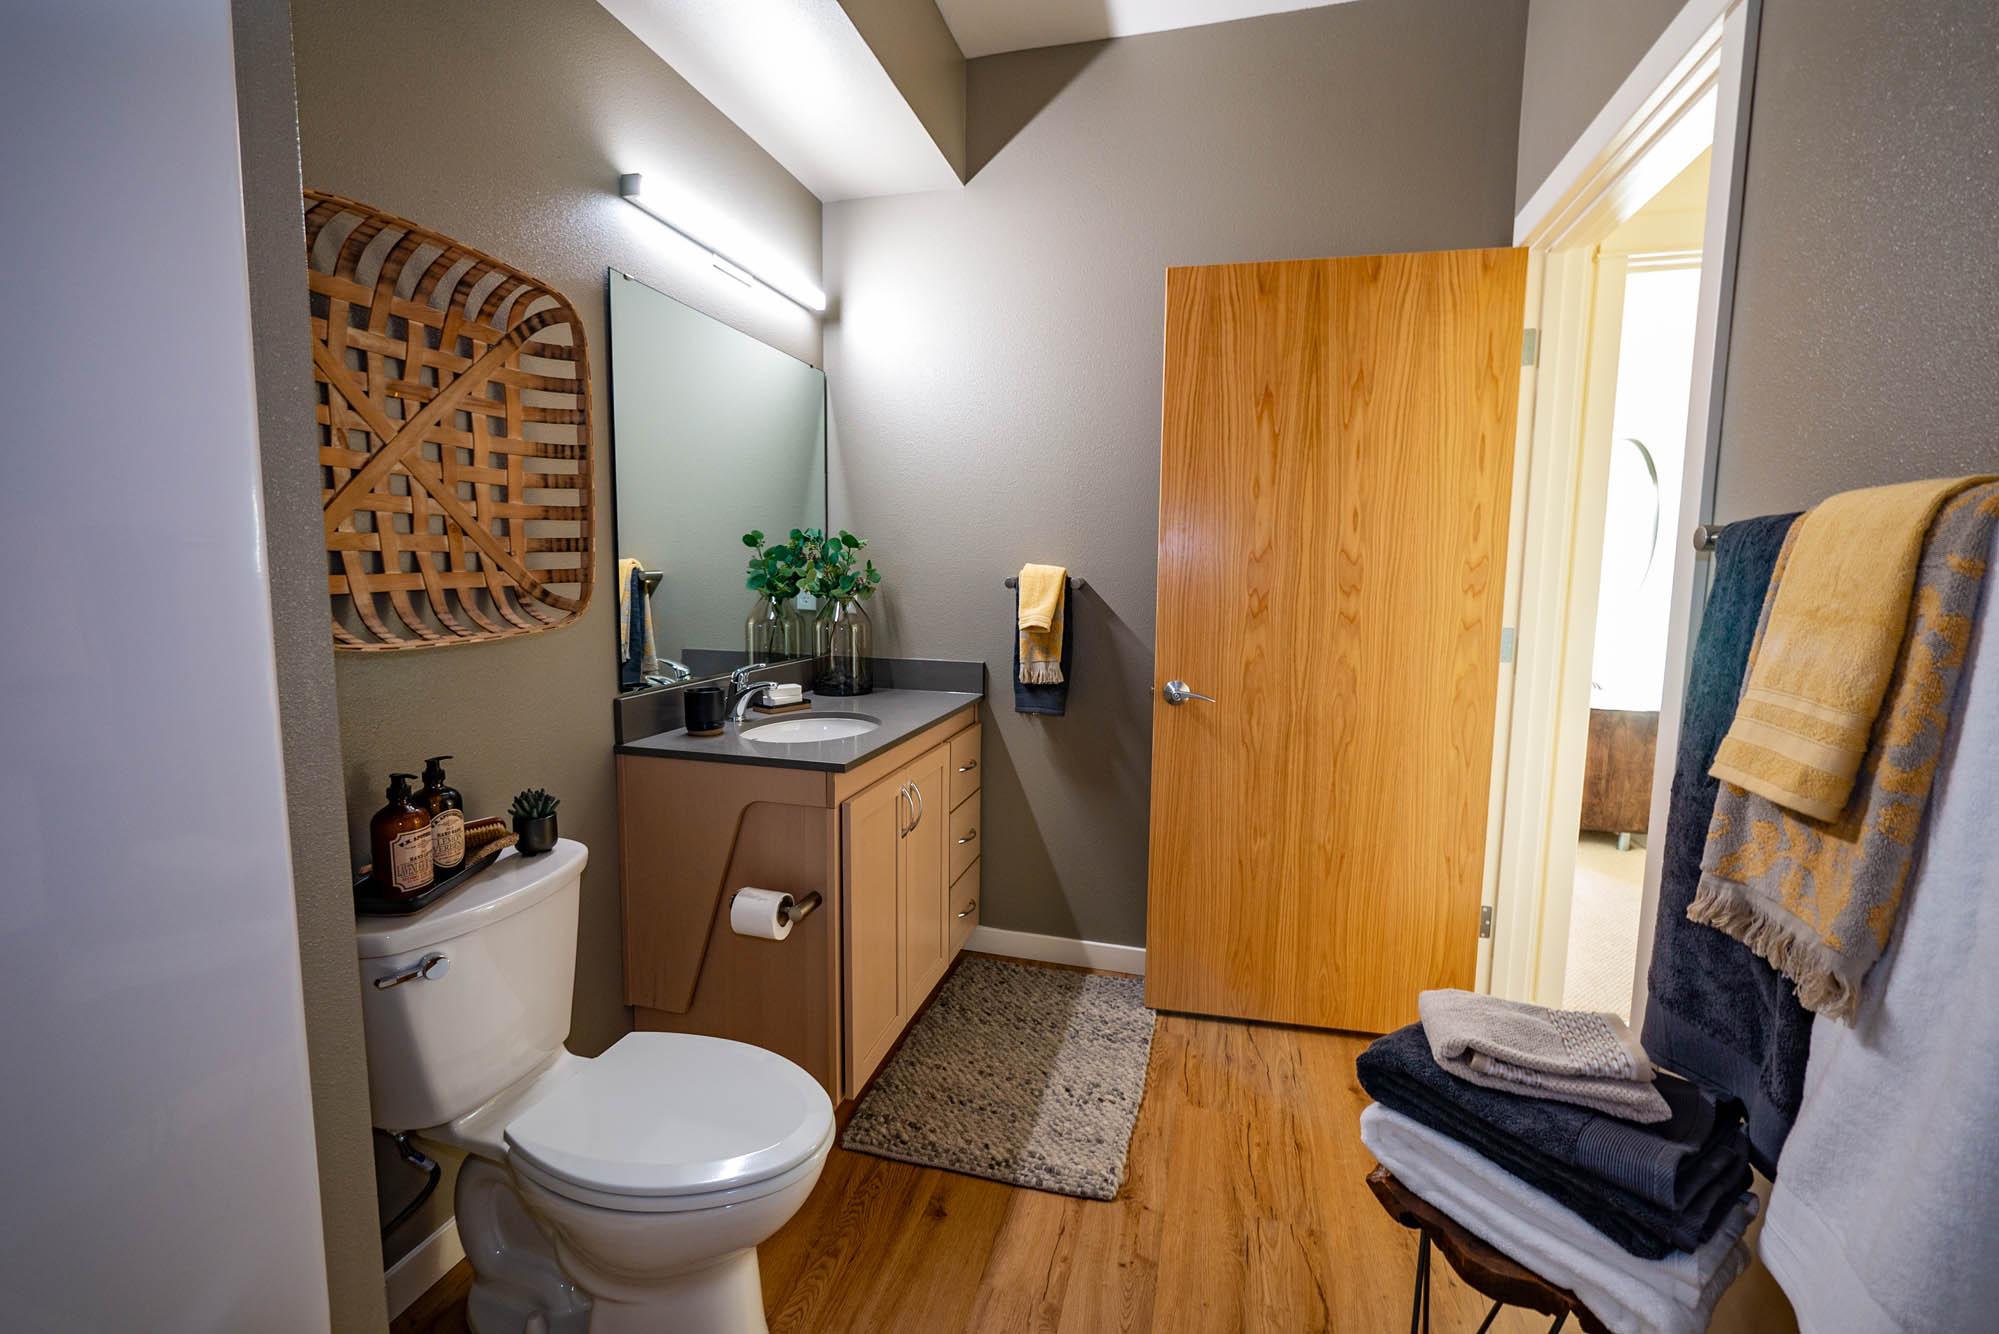 Eugene OR Apartments - Amazon Apartments Bathroom